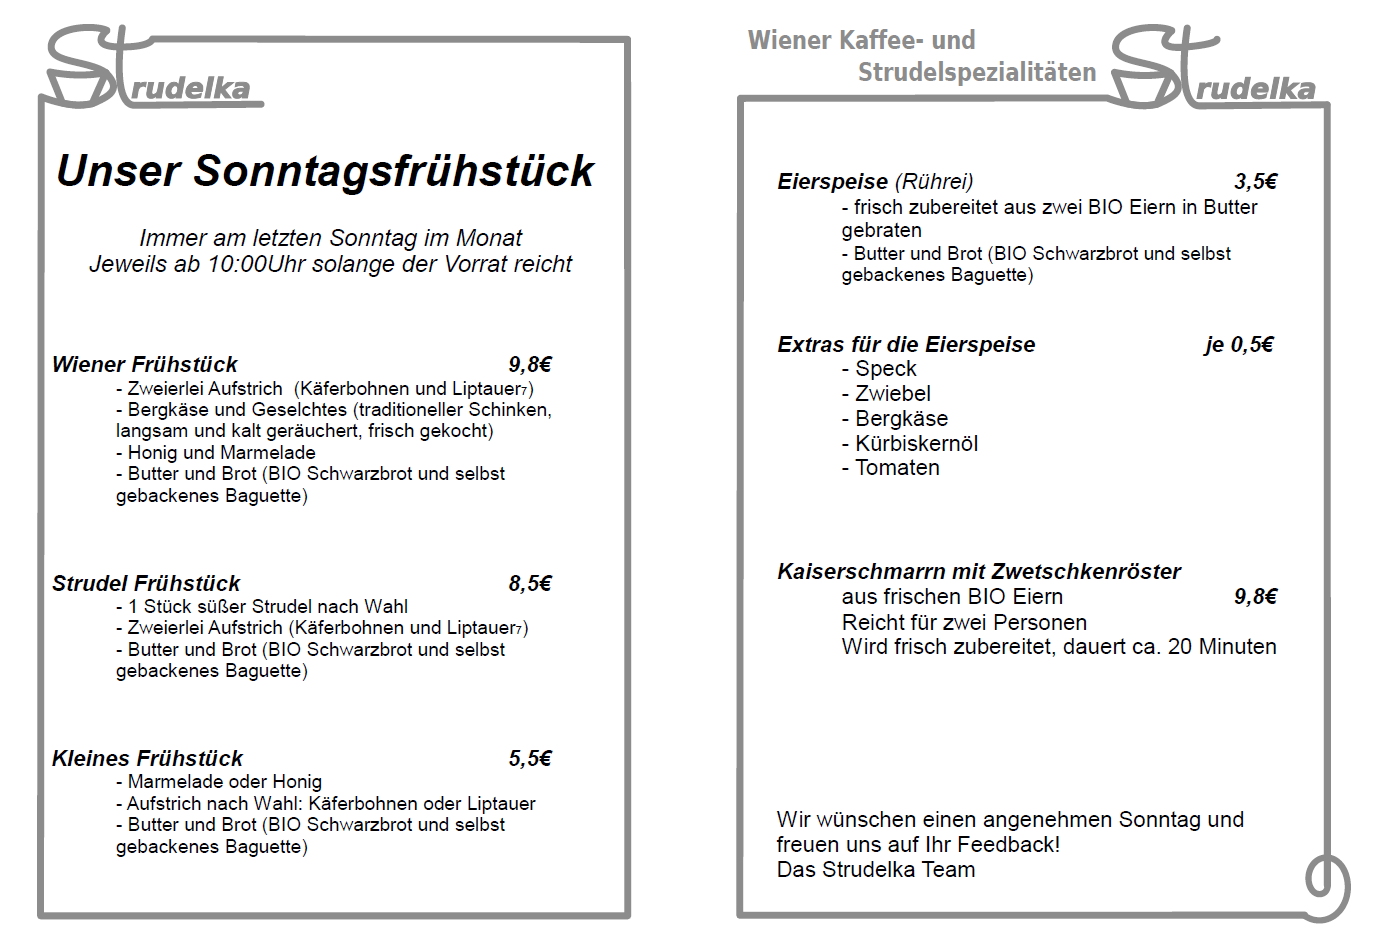 sonntagsb-runch-9-16